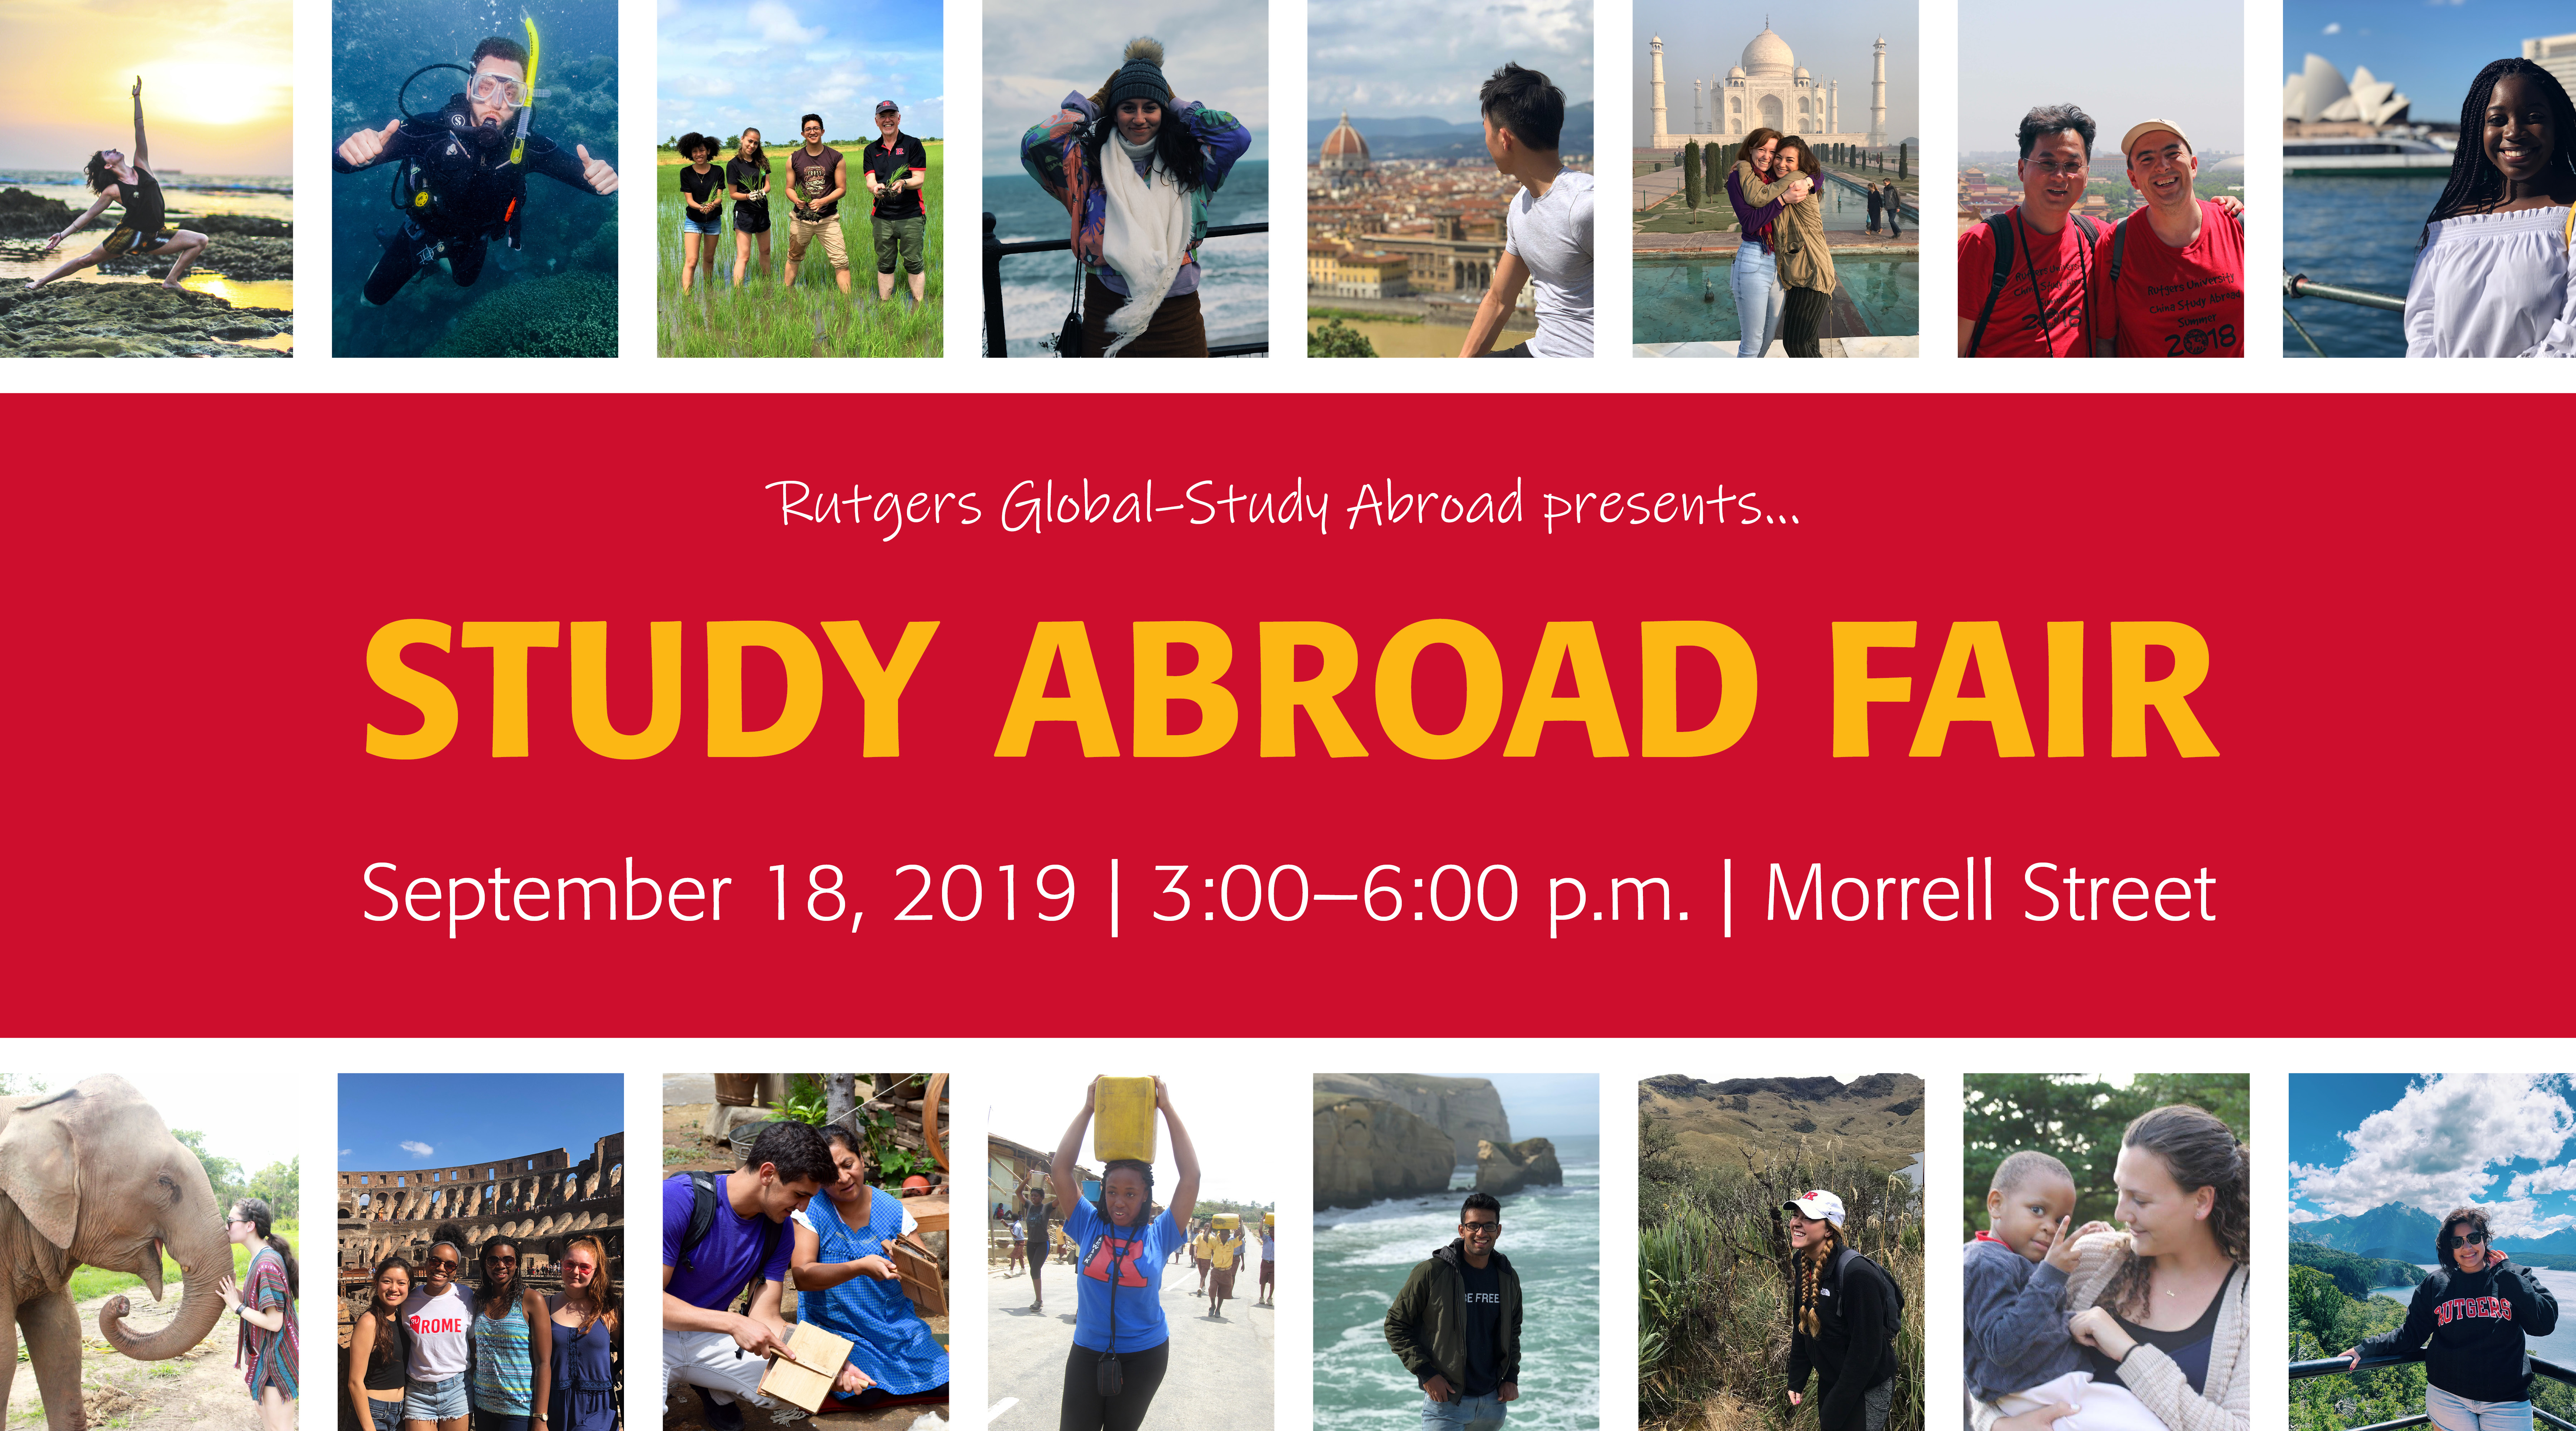 Fall 2019 Study Abroad Fair | Rutgers